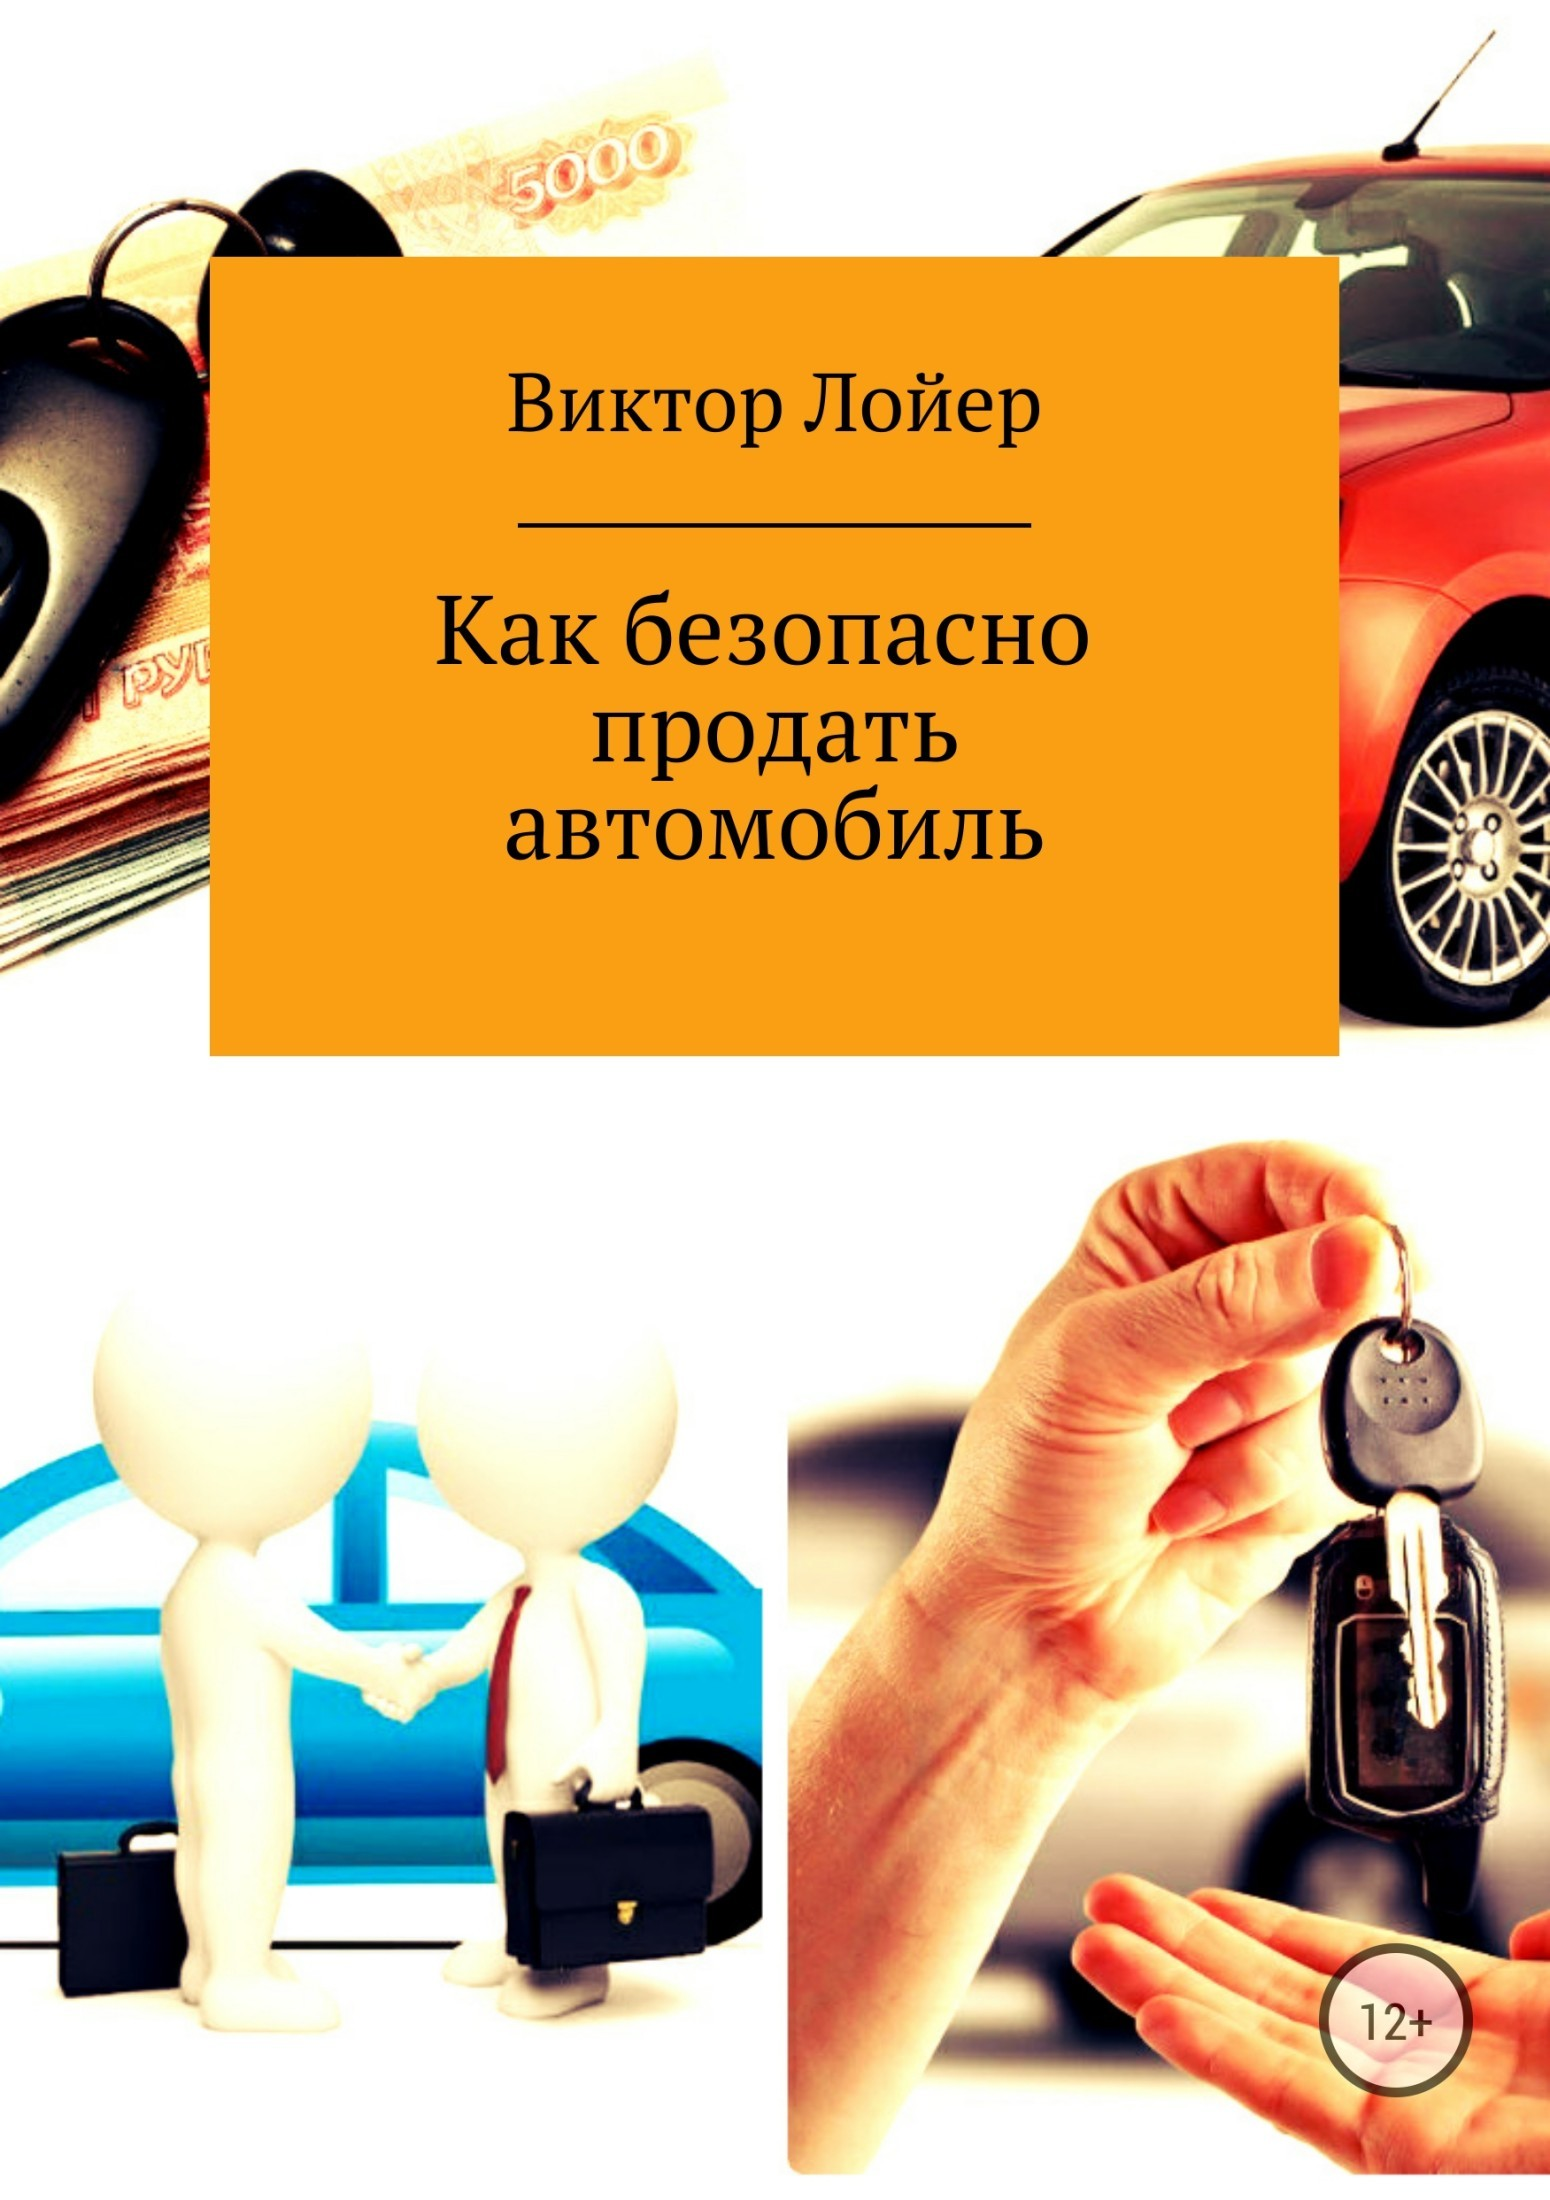 Обложка книги. Автор - Виктор Лойер